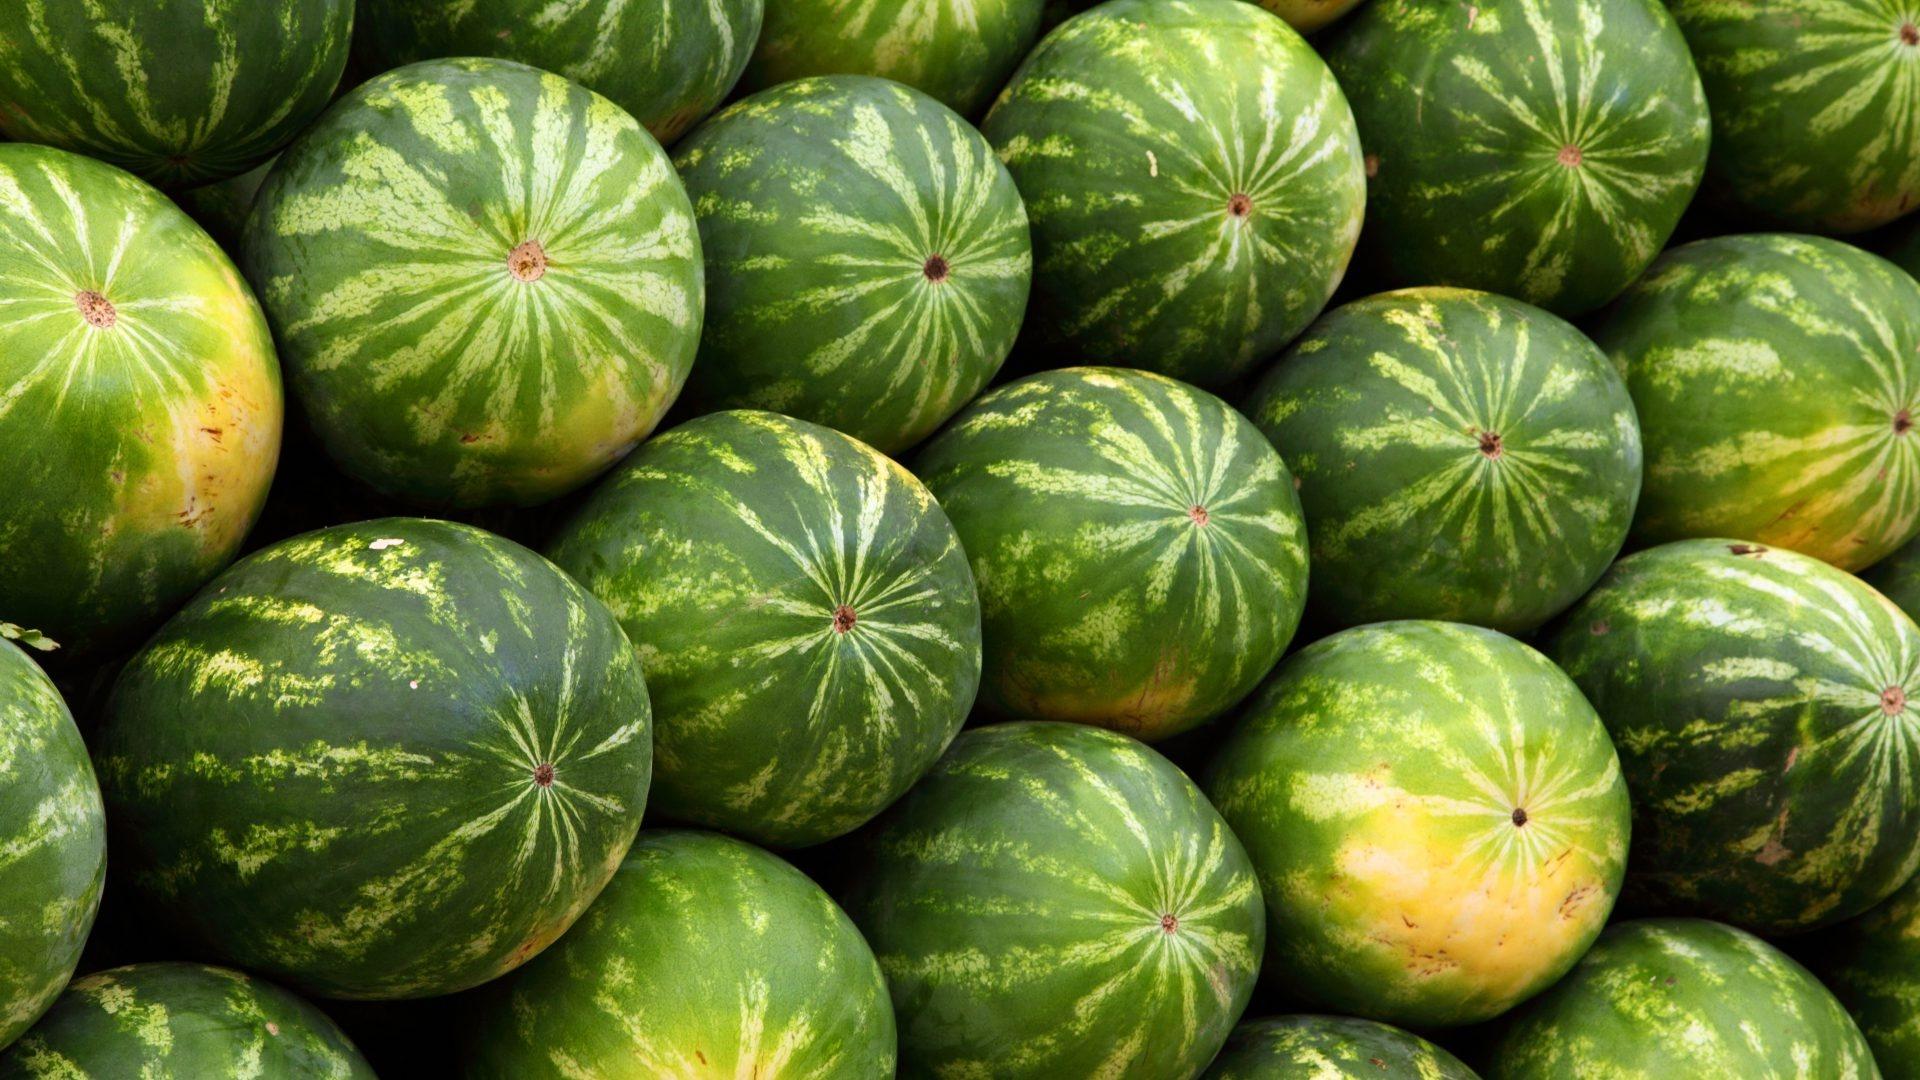 Watermelon background wallpaper